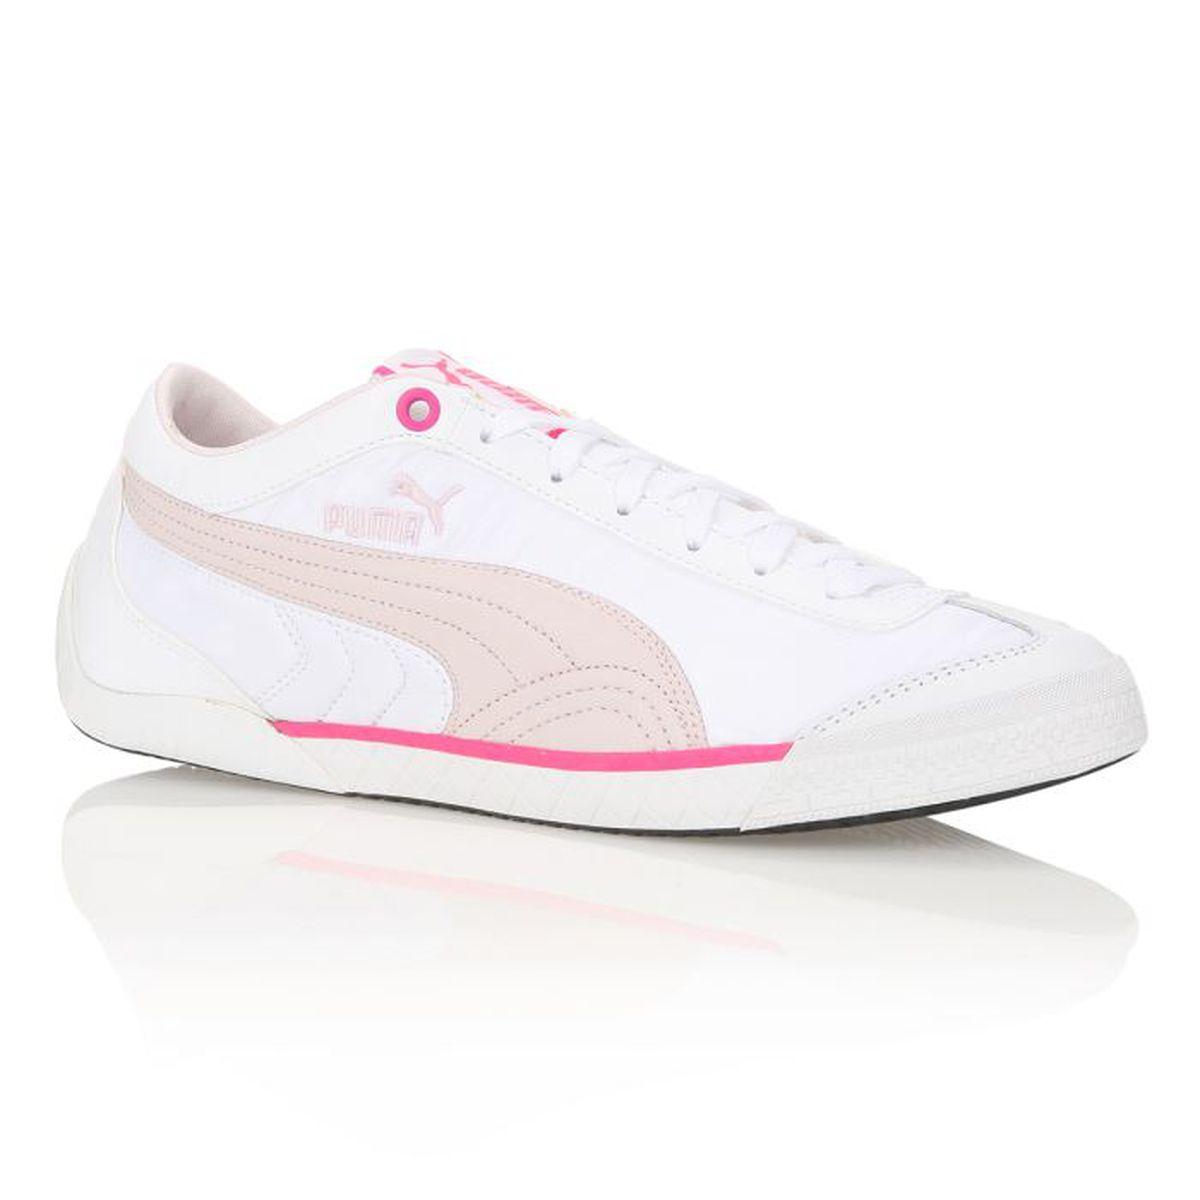 Femme Achat Blanc 2 Chaussures Rose 9 Puma Seasonal Et Sportswear w7XnC